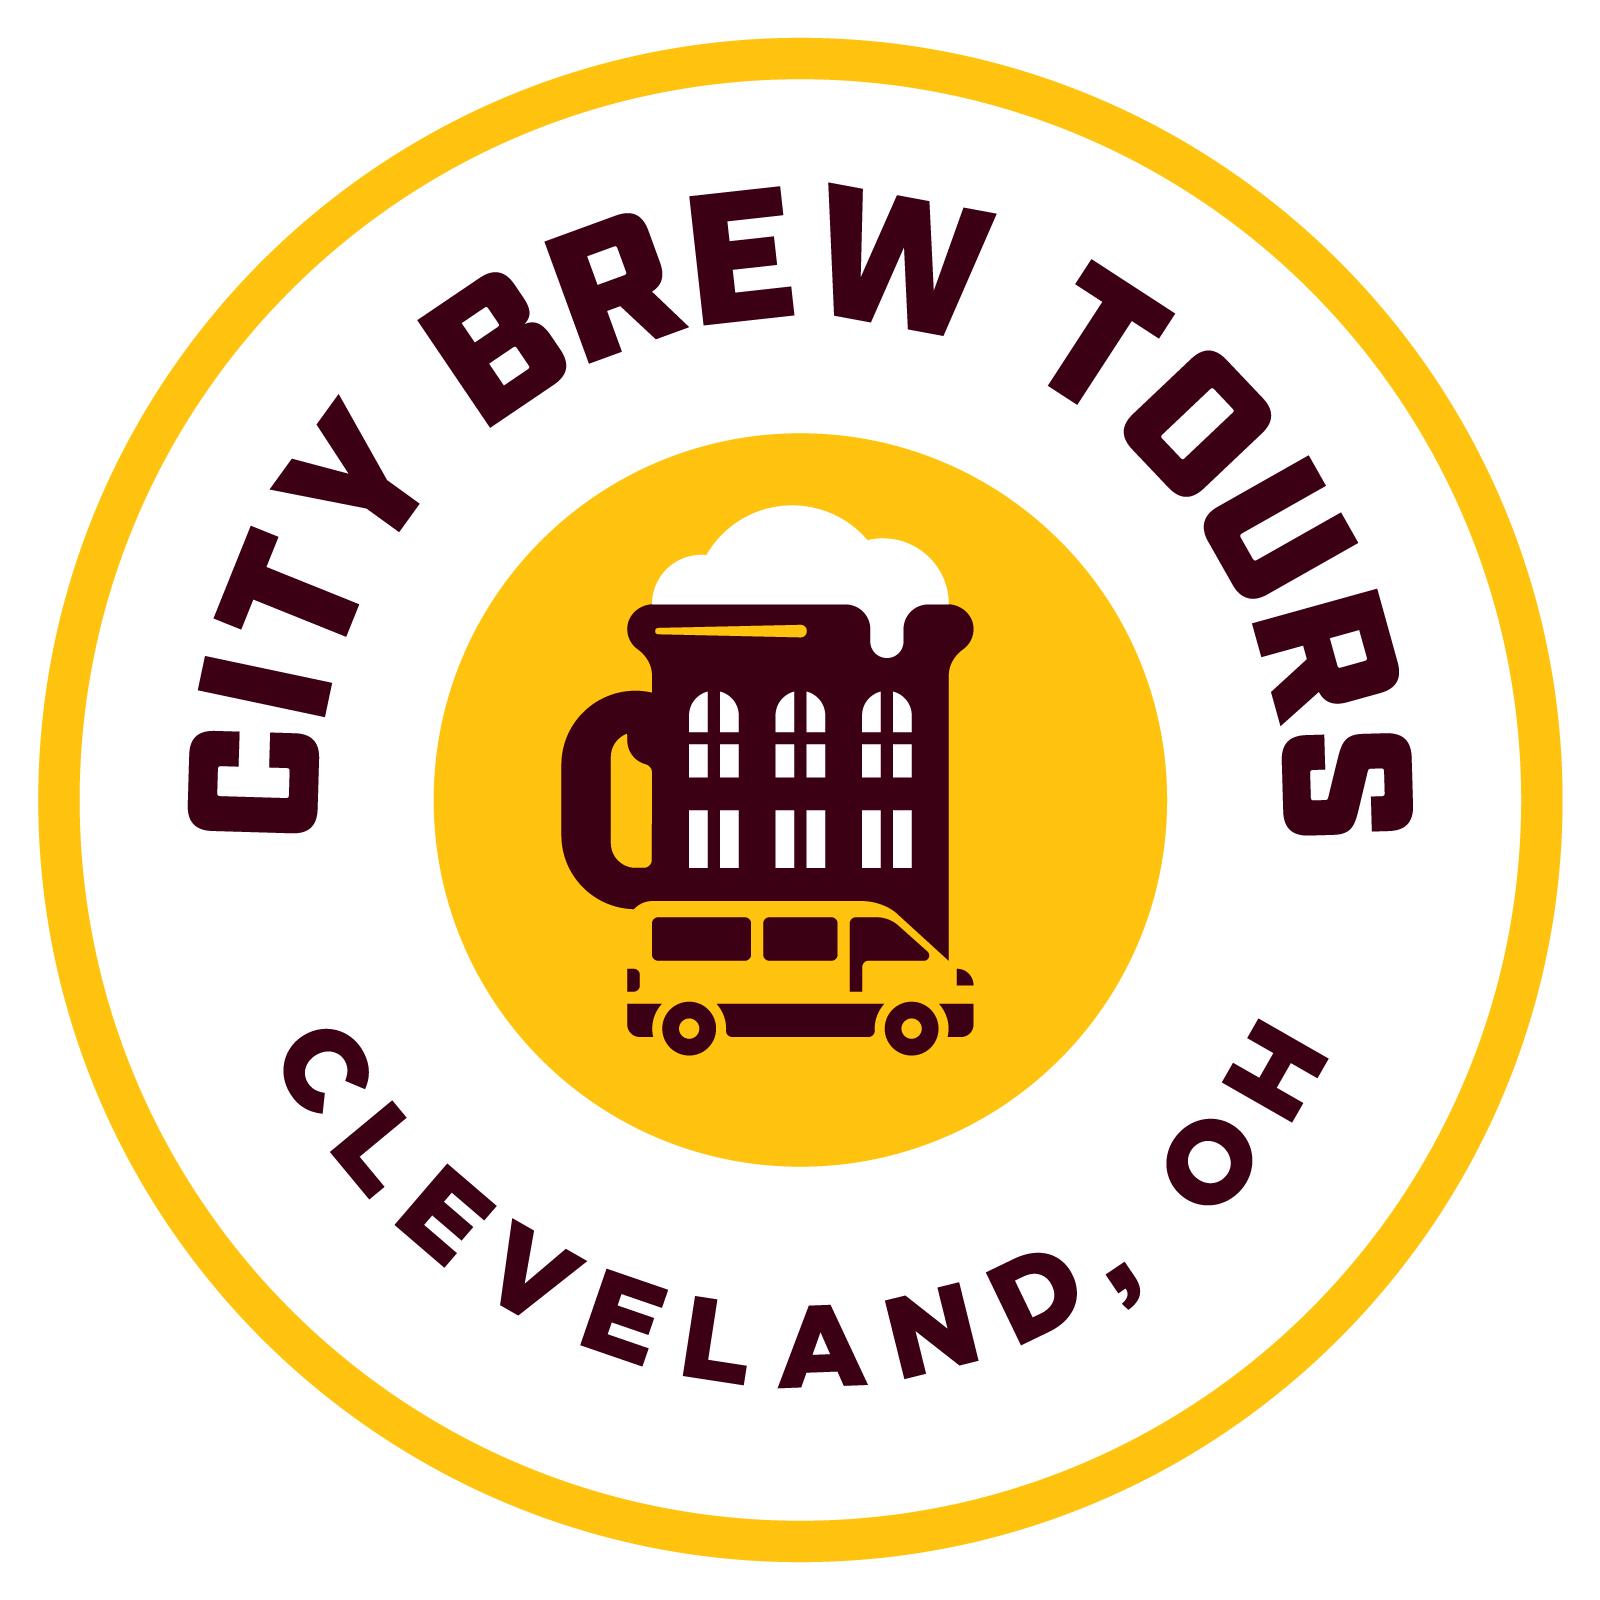 cleveland-logo-circle.jpg